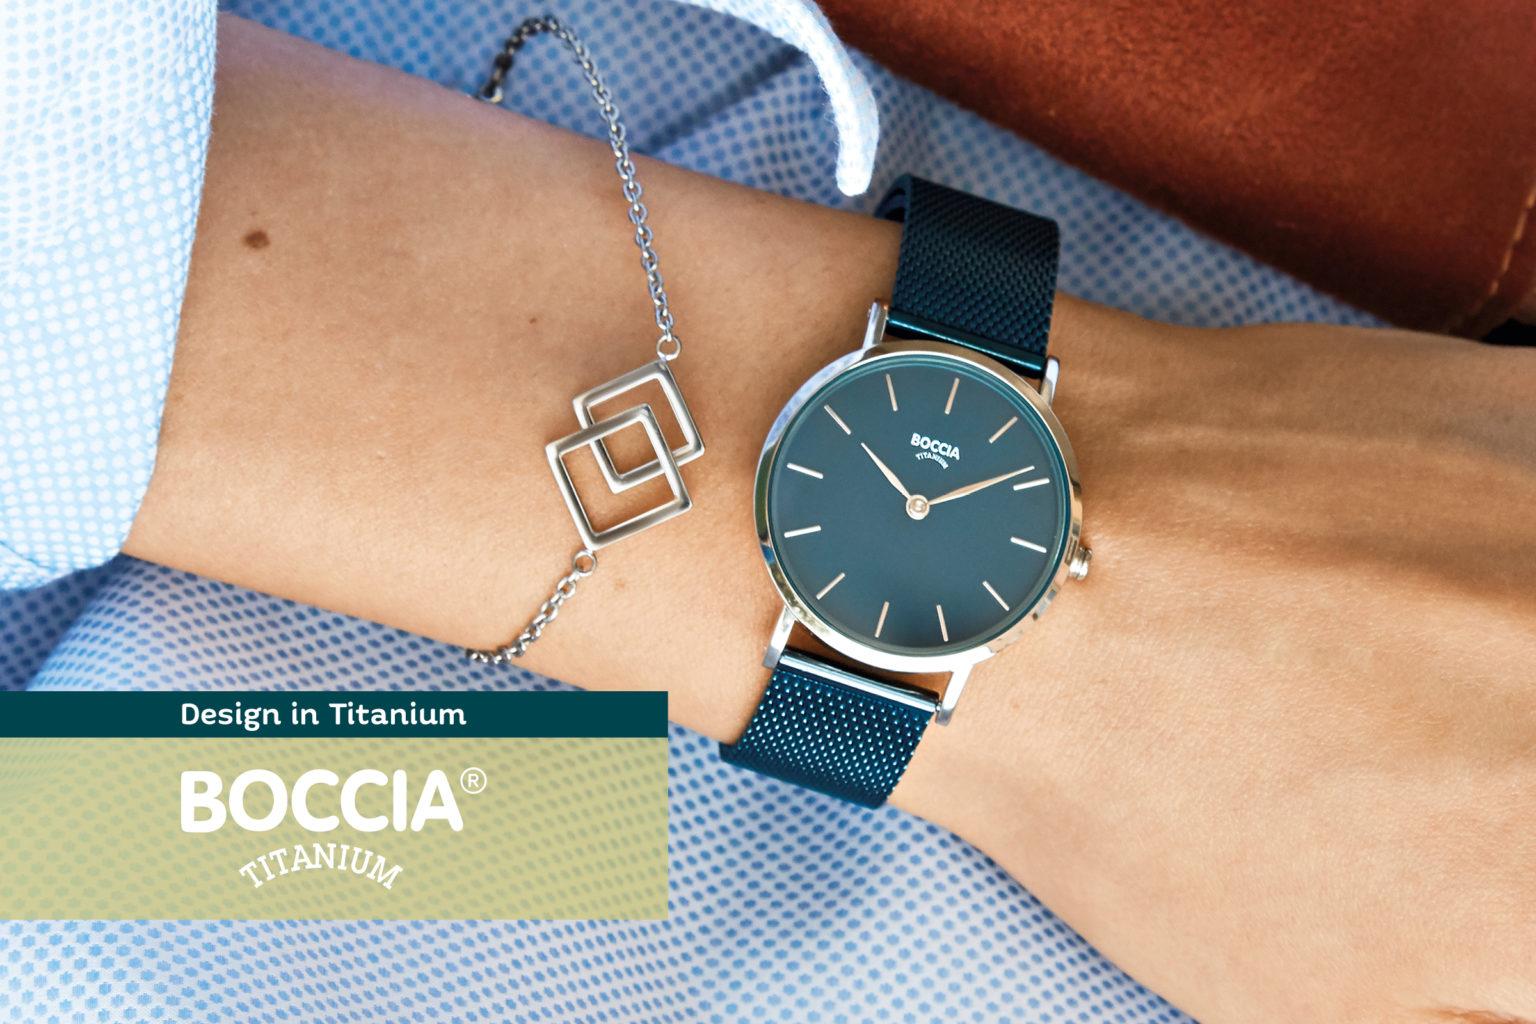 Boccia_Banner_Uhr3281-07_Armband03021-0___2400 x 1600 px